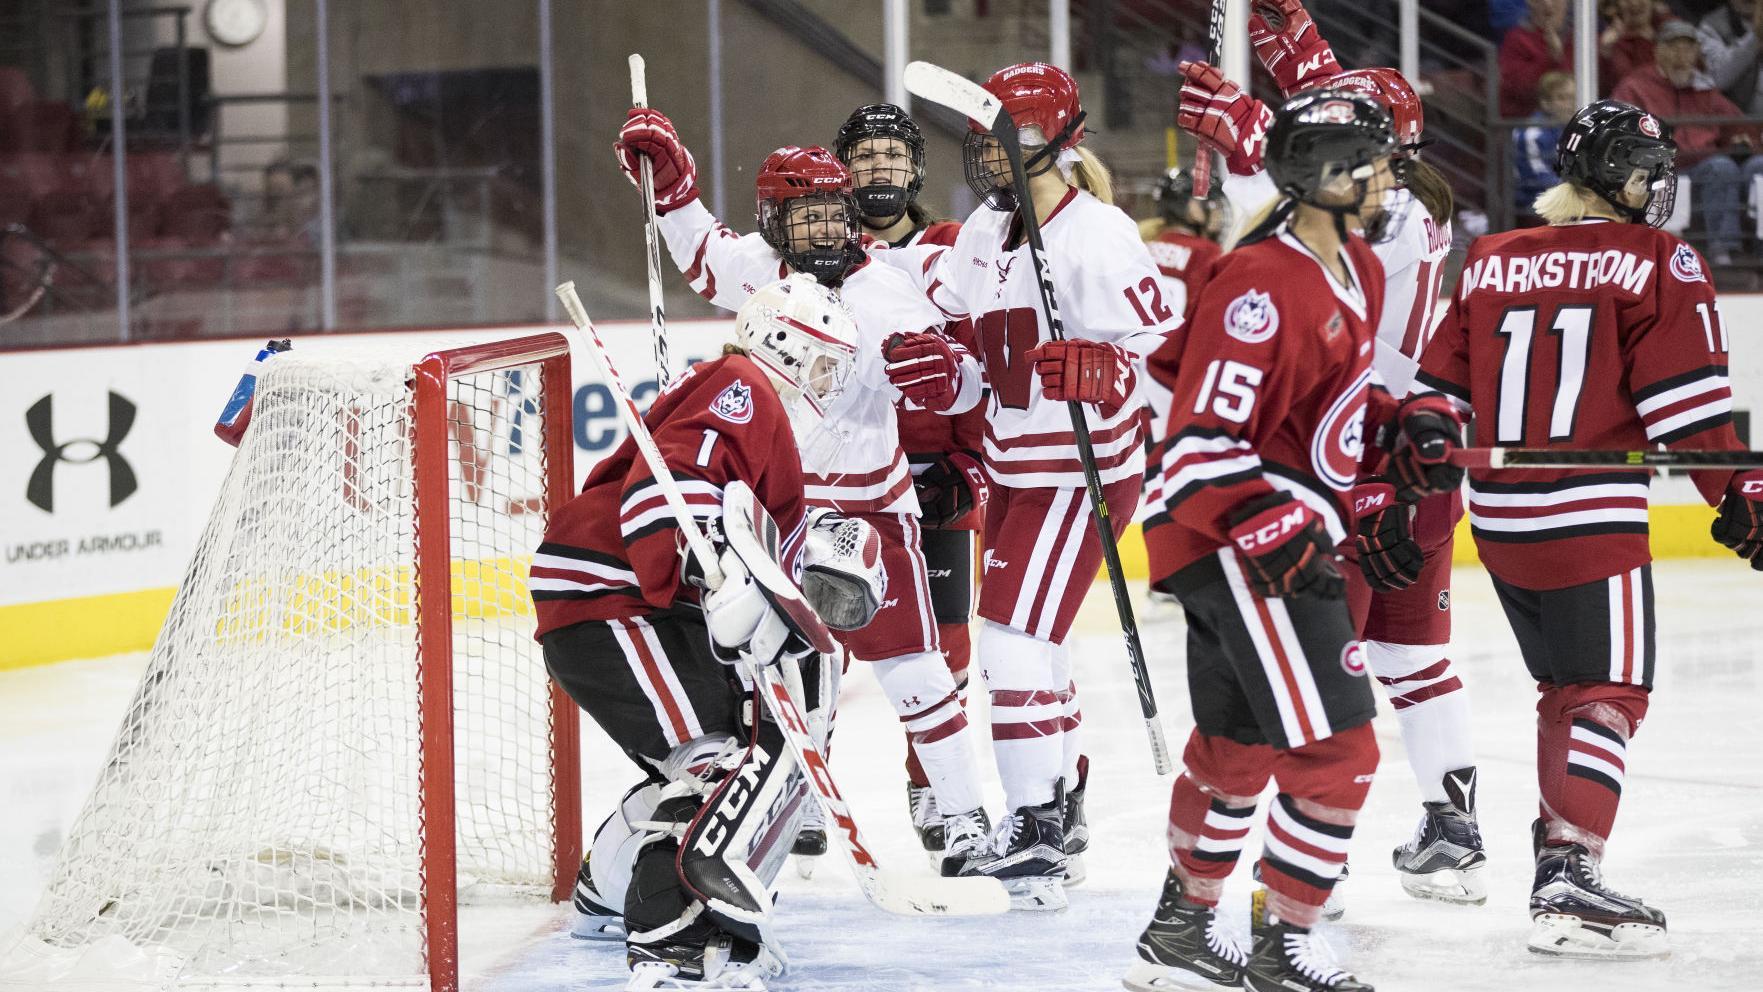 Badgers women's hockey: Claudia Kepler, Baylee Wellhausen named Wisconsin's 2017-18 captains